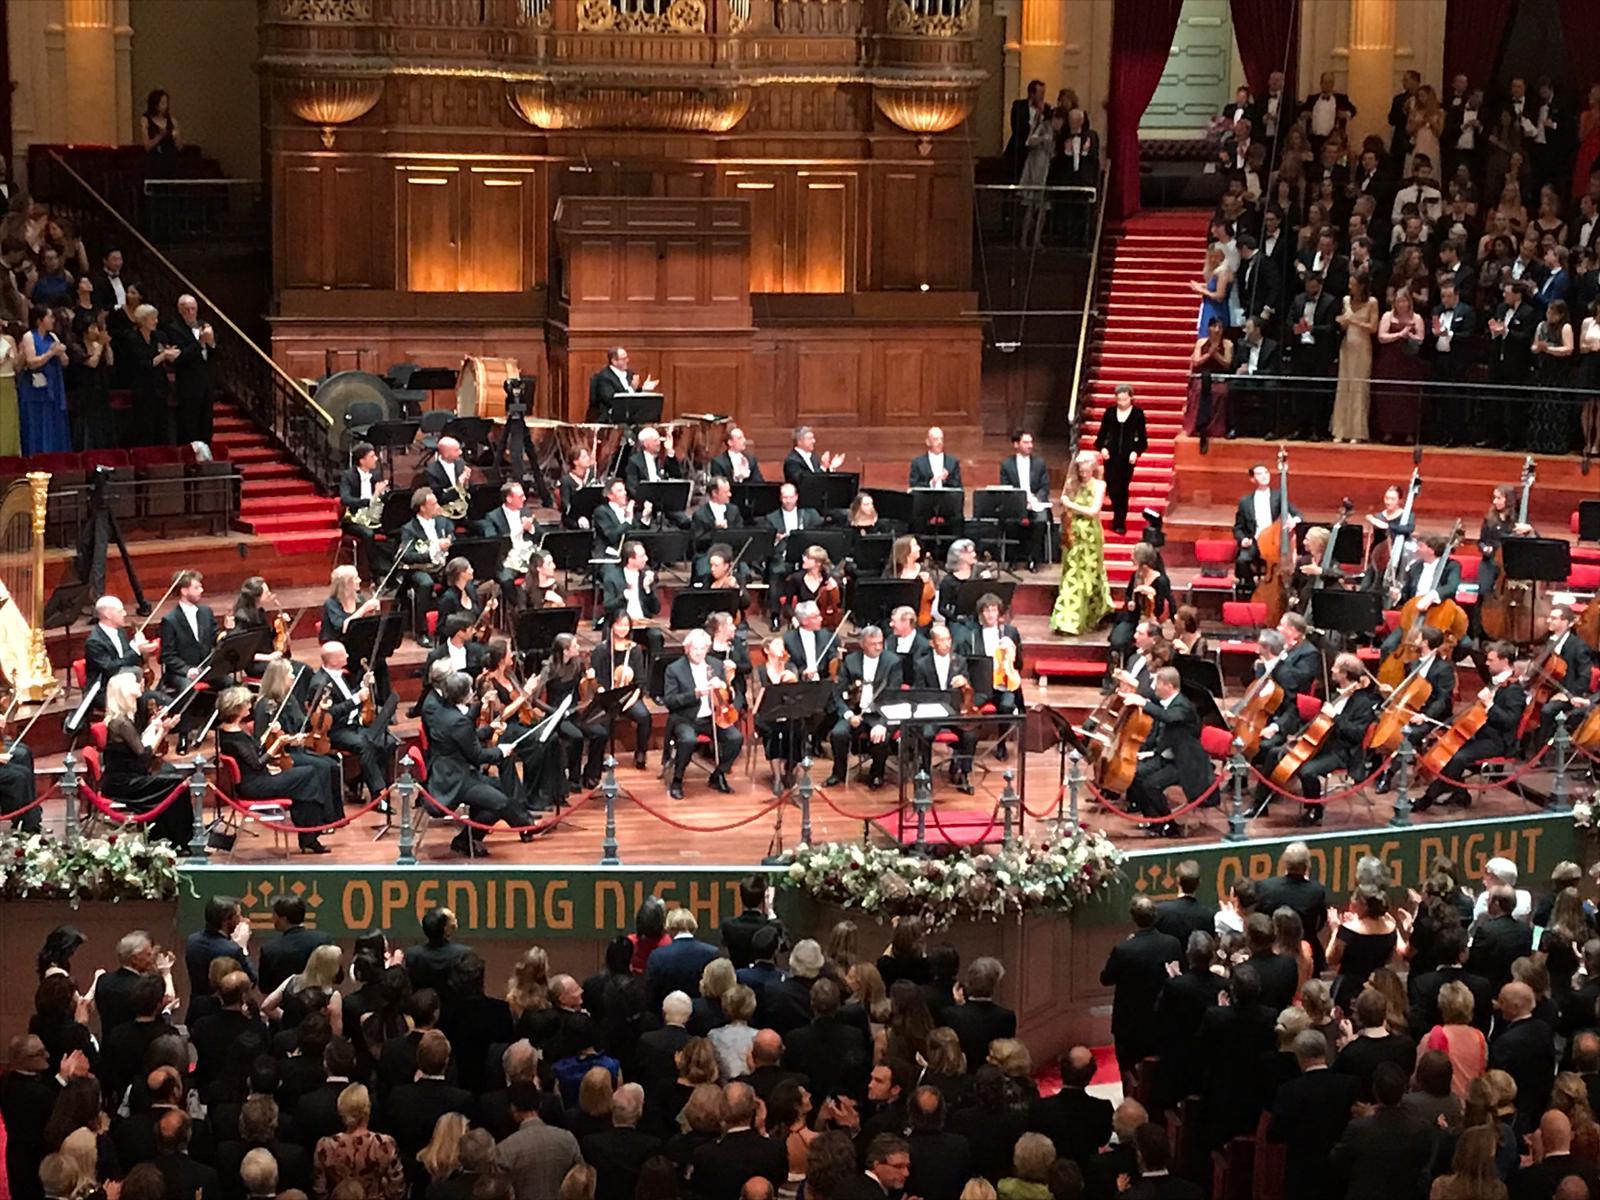 Simone Lamsma opens Royal Concertgebouw Orchestra 19/20 season